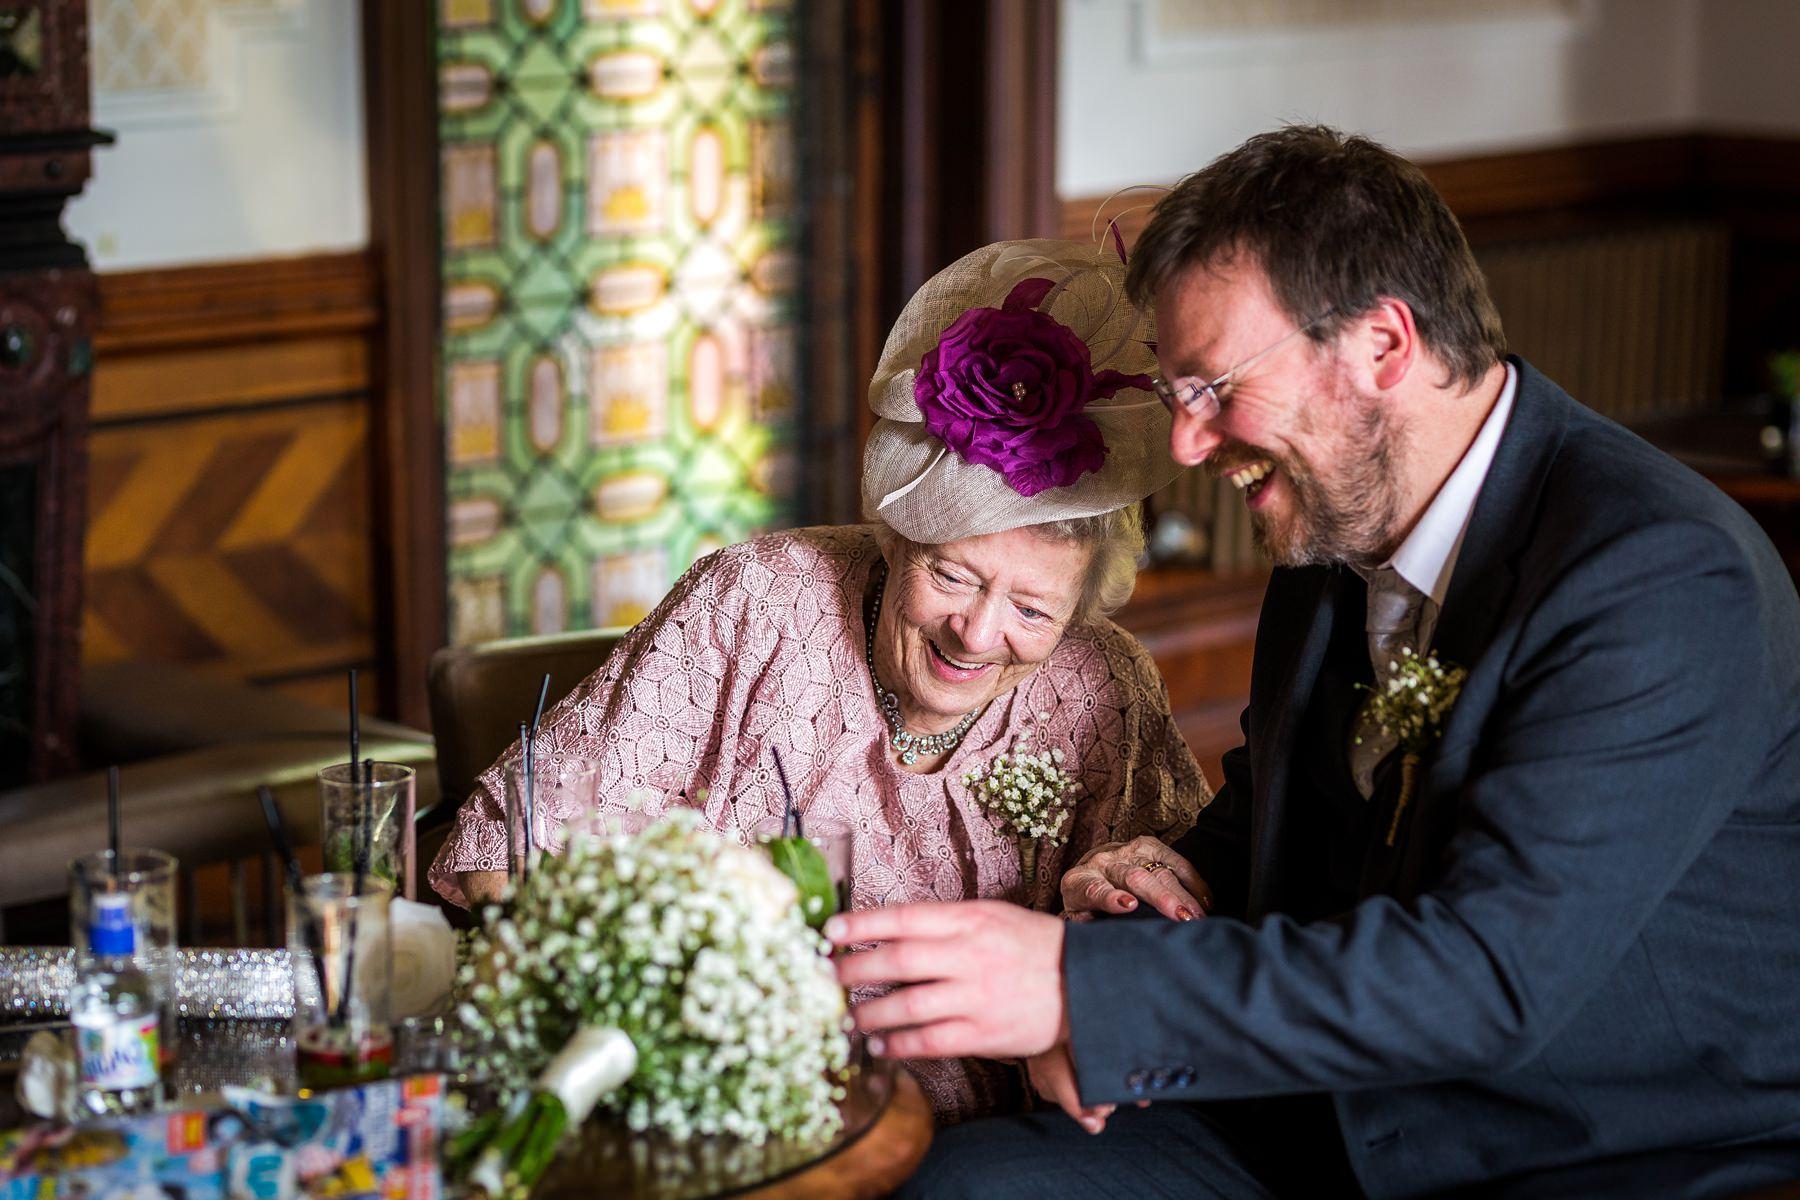 intimate-wedding-at-kilhey-court-lancashire-photographer_0025.jpg